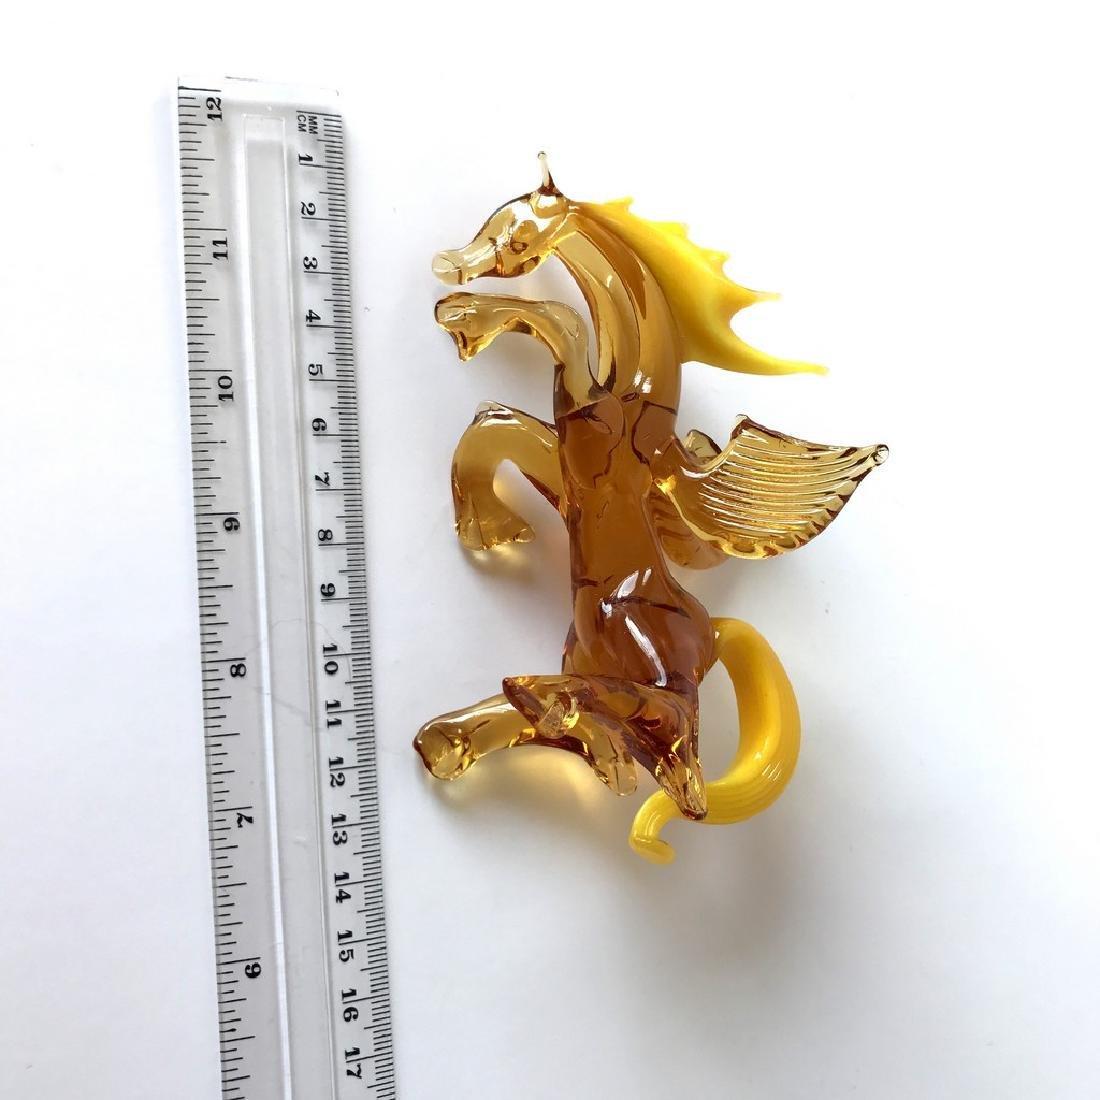 Figurine of Pegasus the winged horse amber coloured - 6